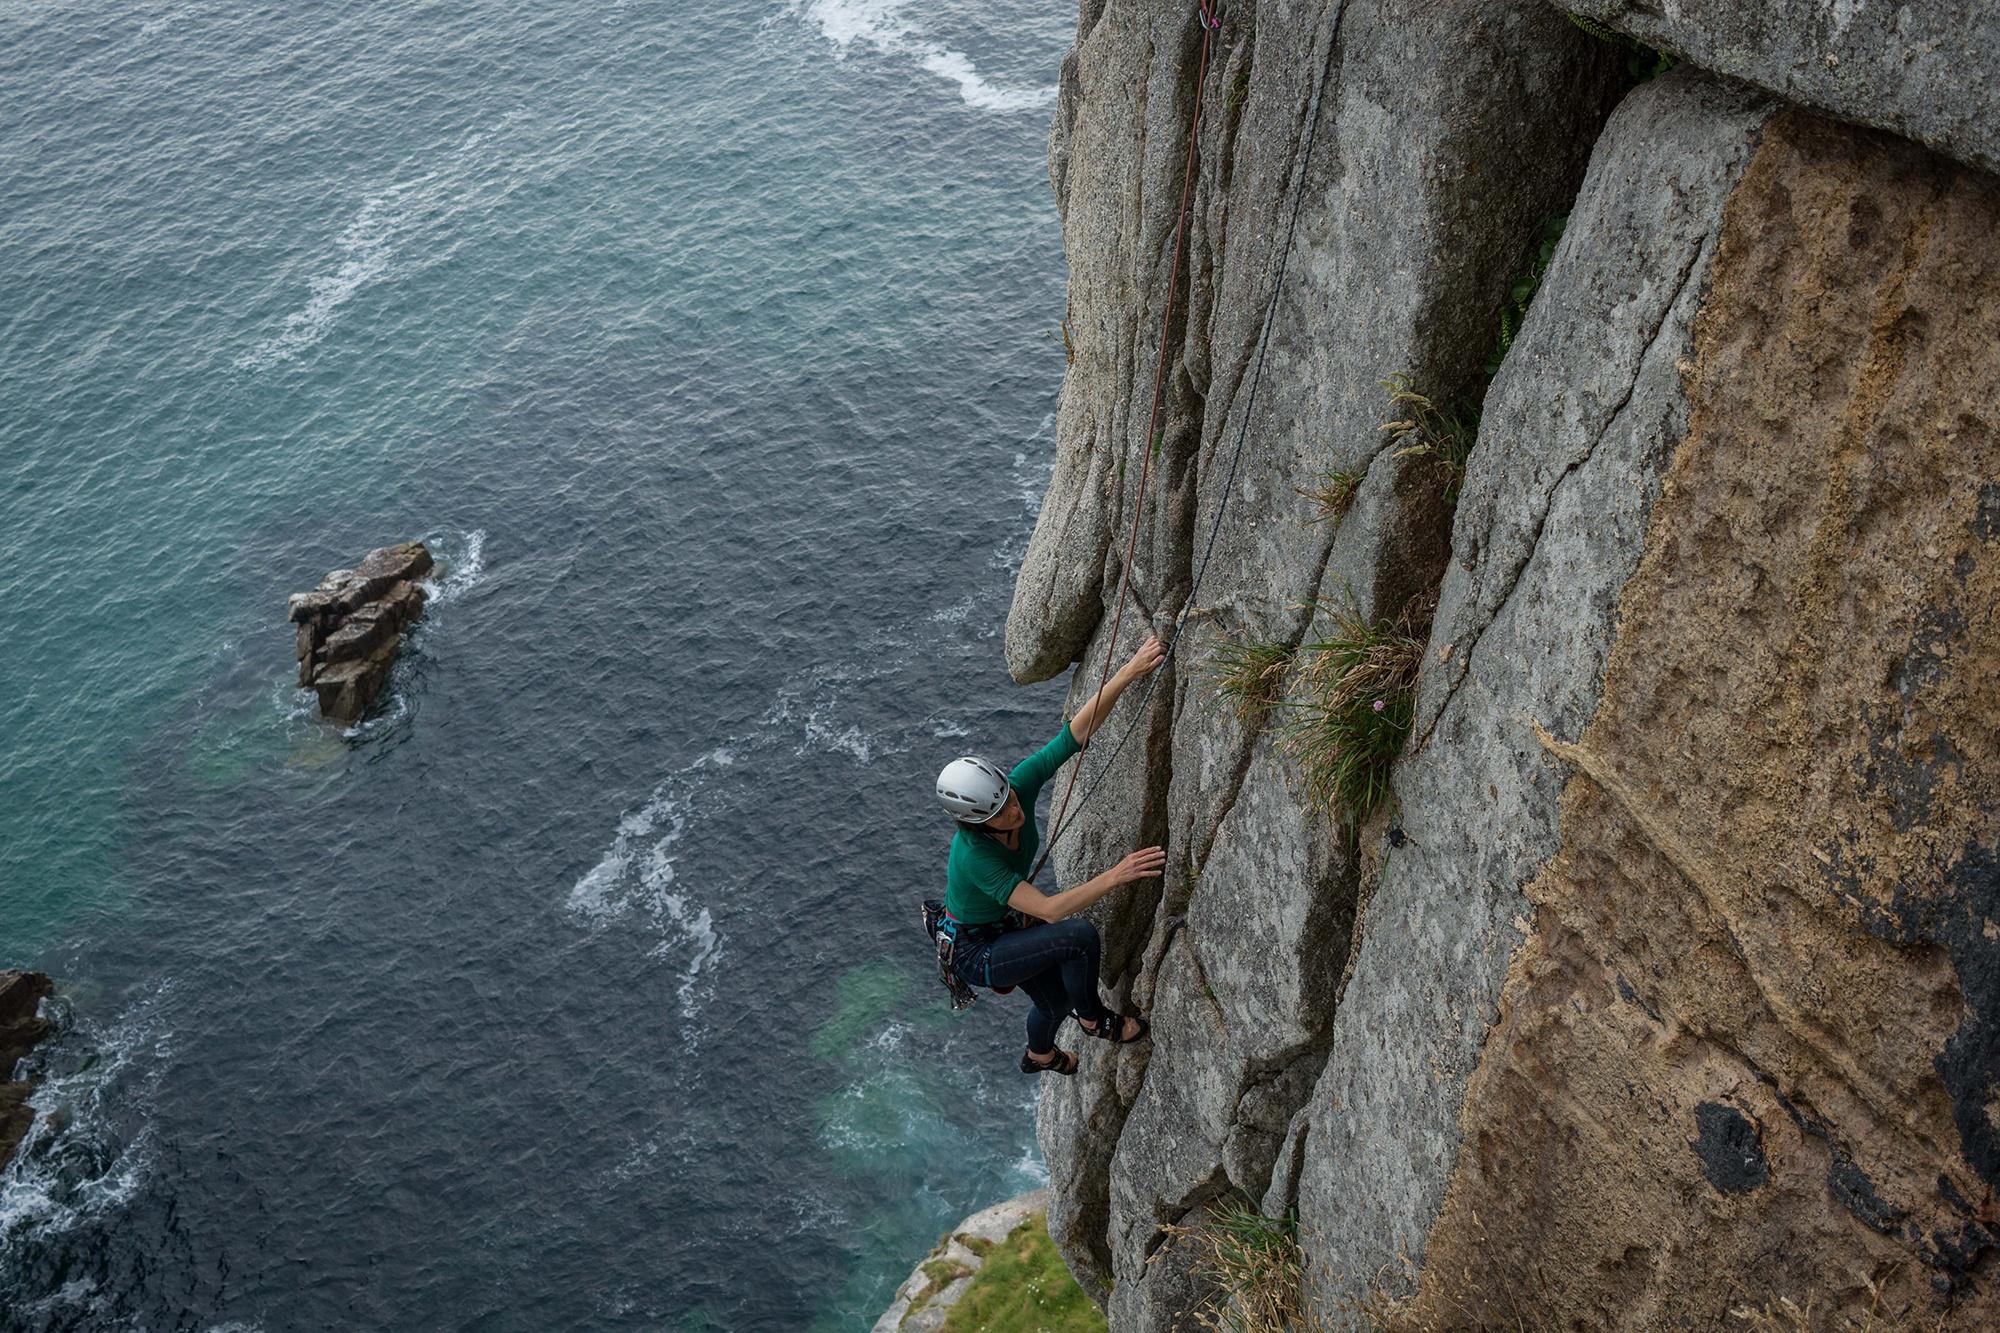 Photograph of Joan Stewart climbing on Doorpost, shot by Jessie Leong